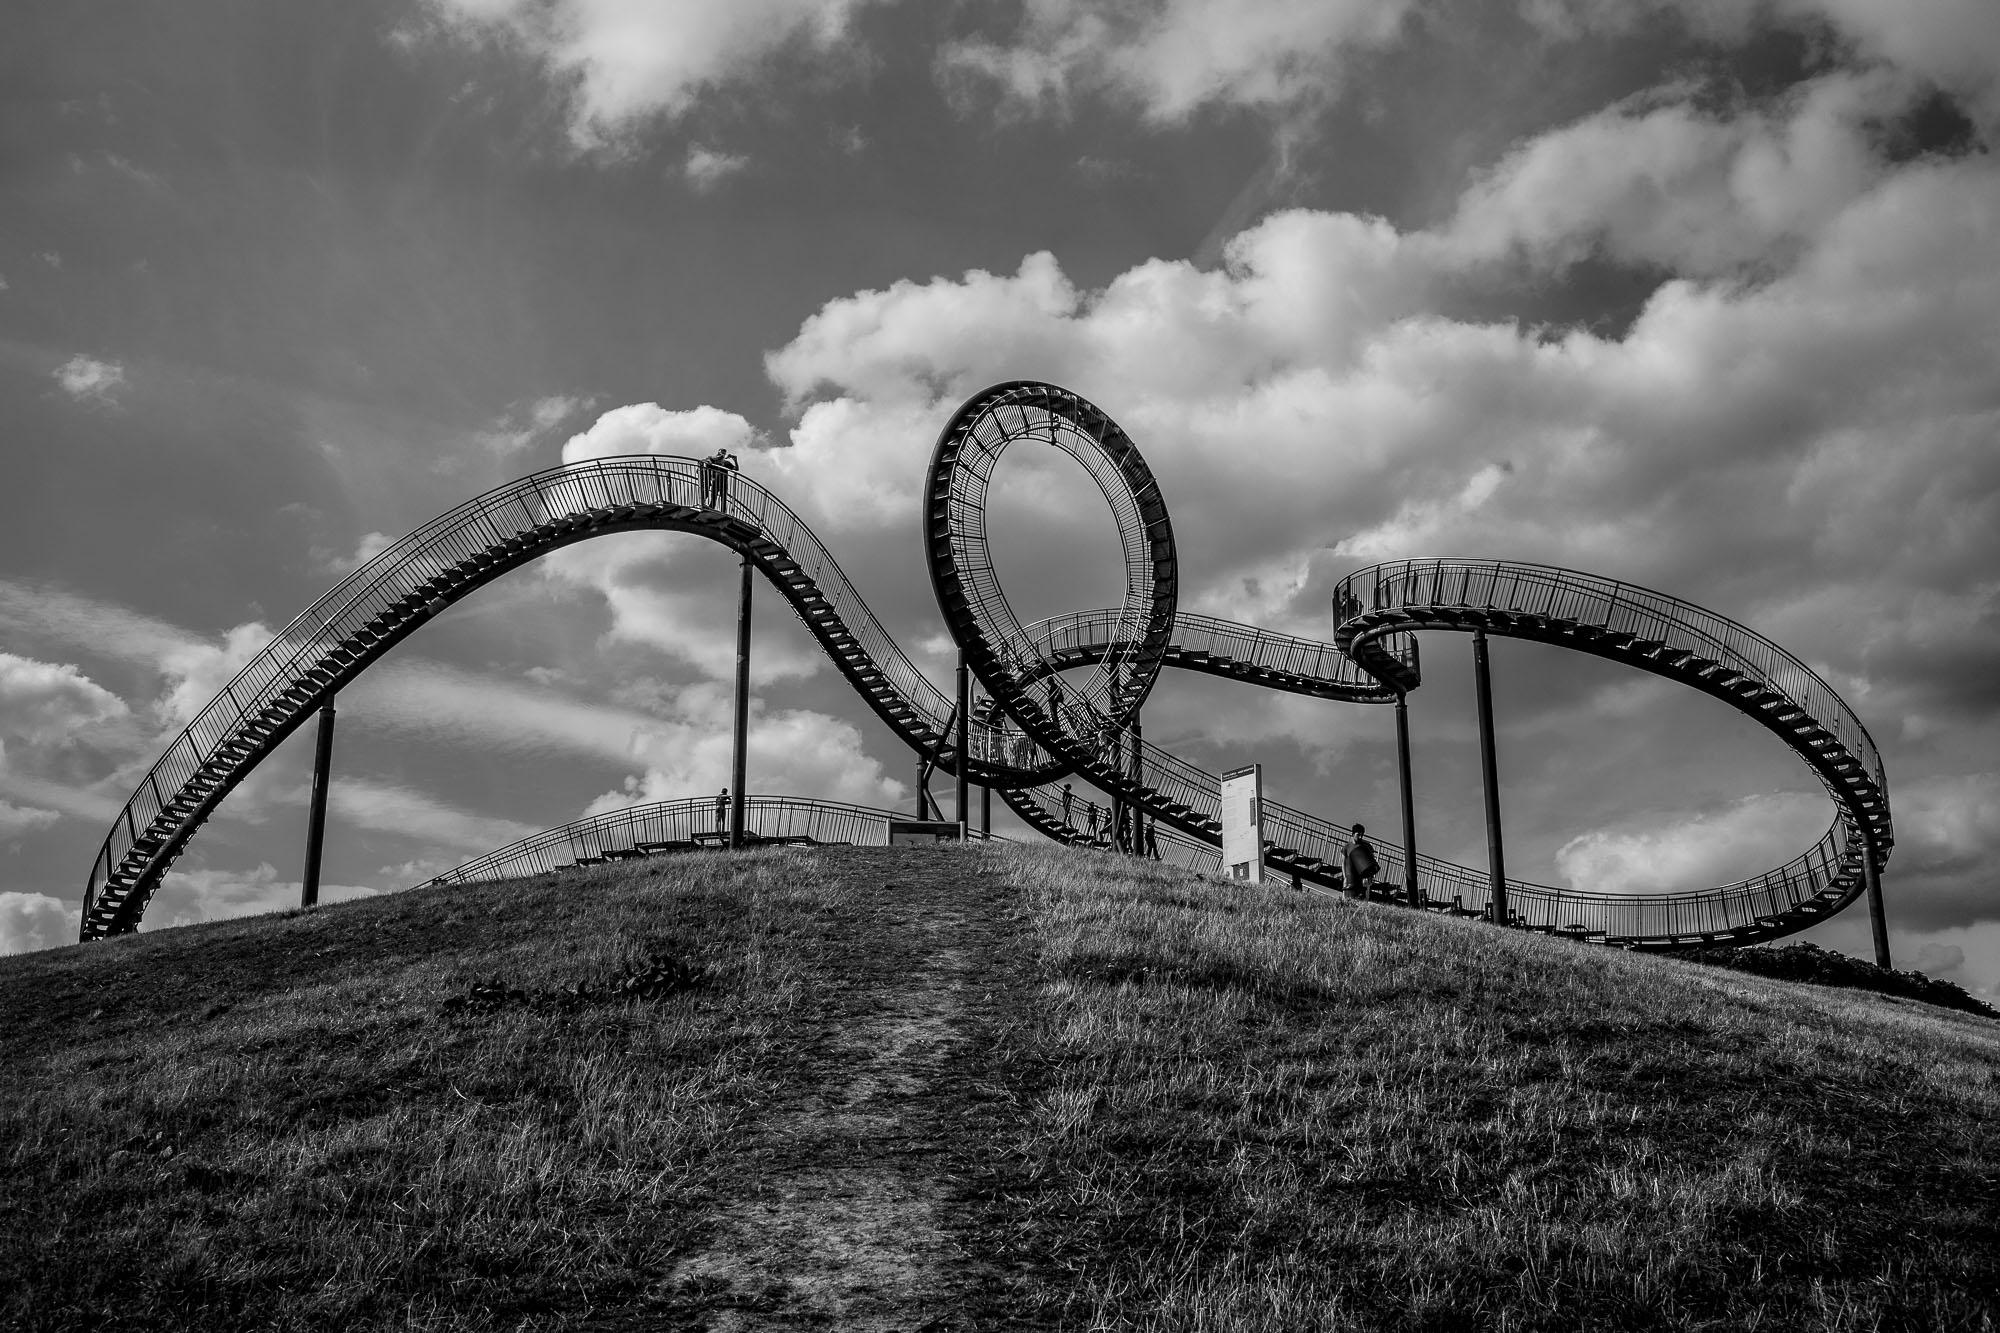 Tiger & Turtle, Magic Mountain in Duisburg